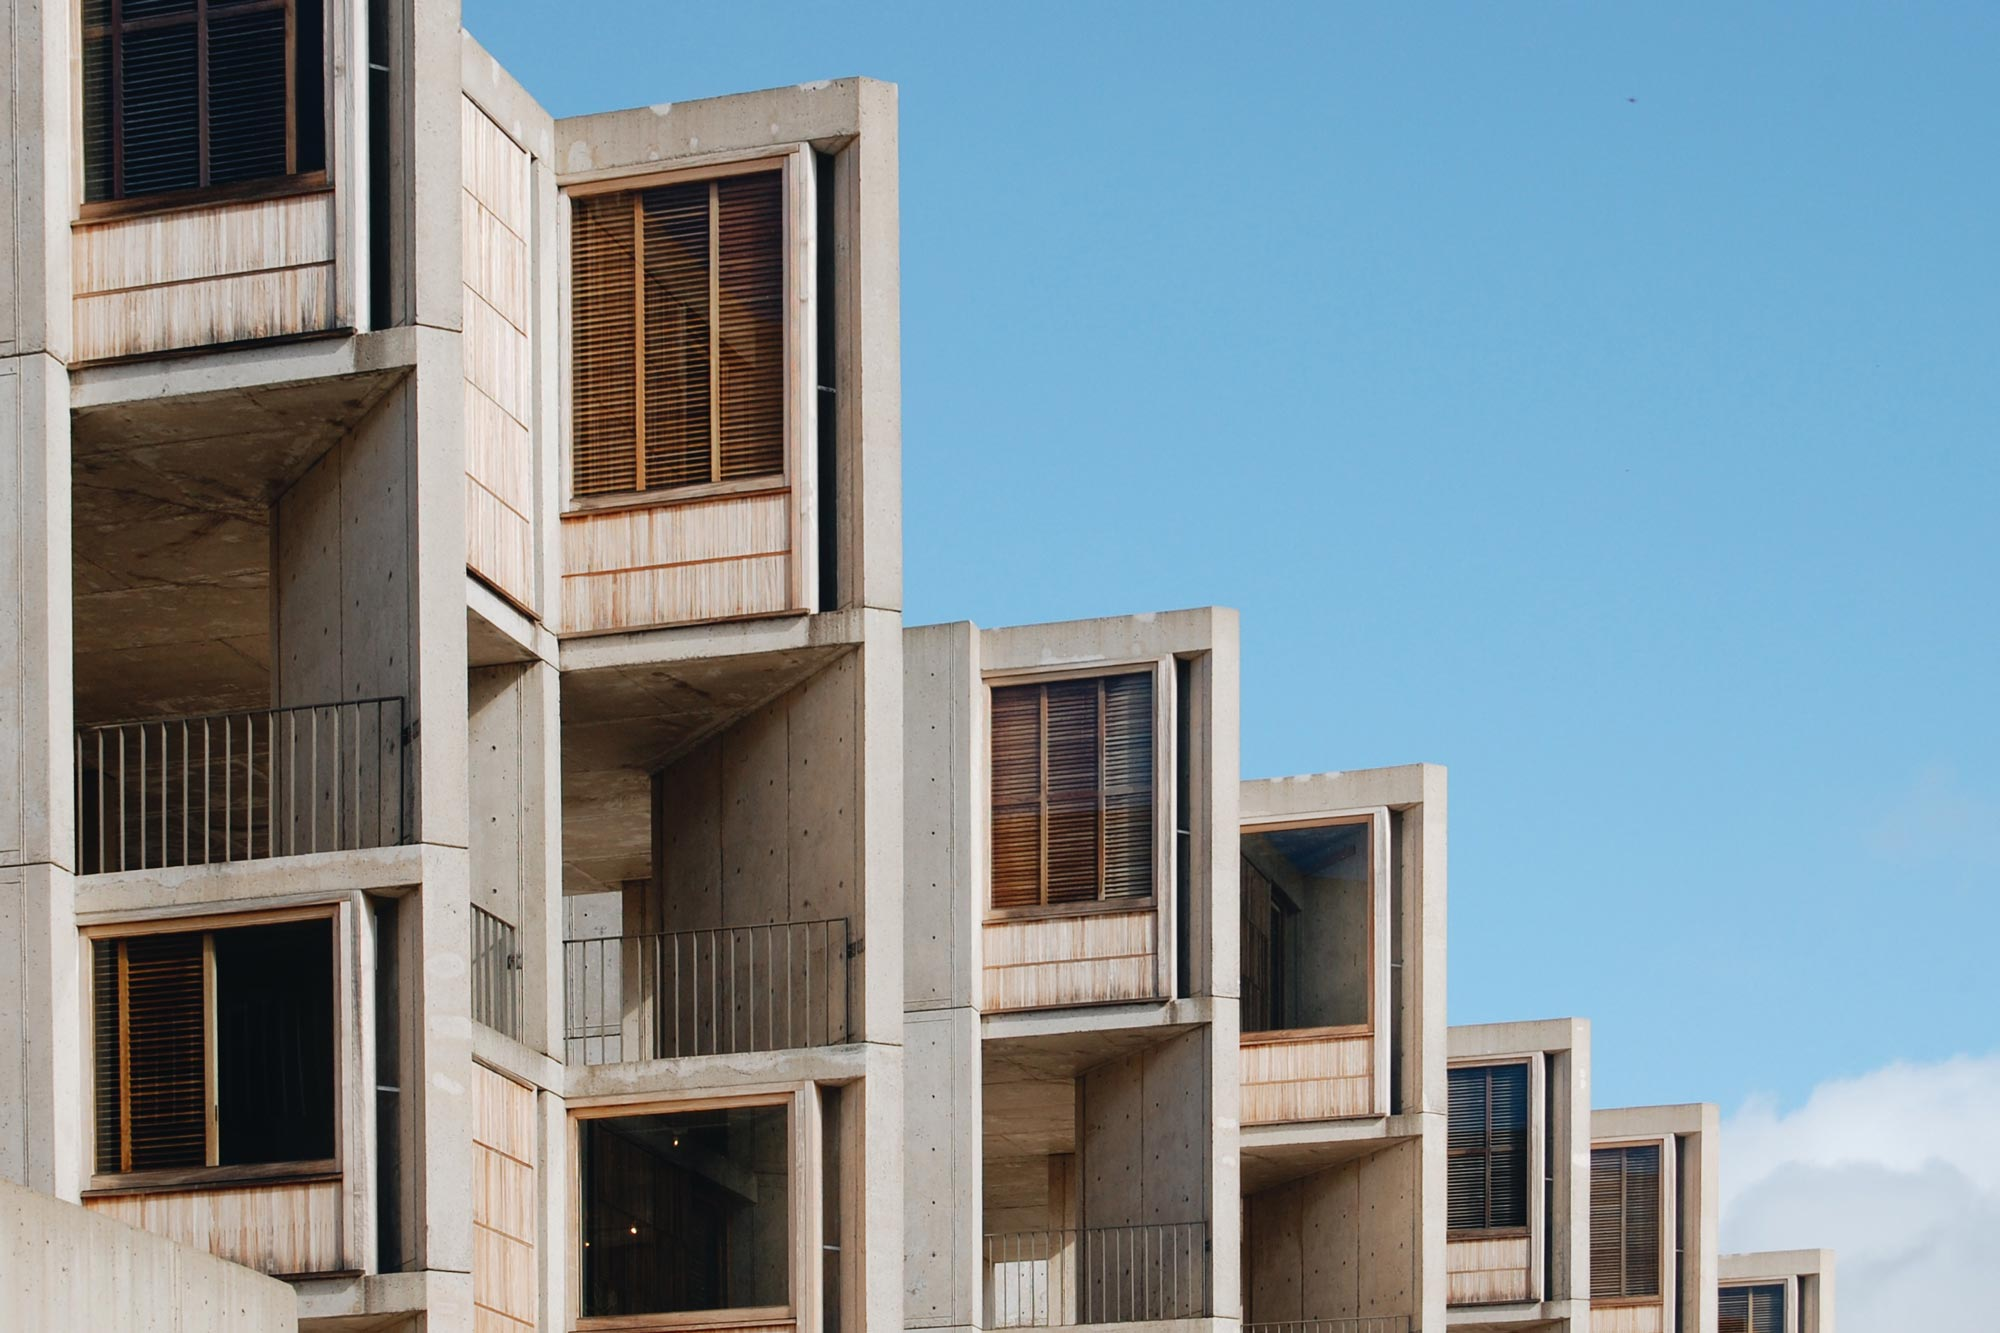 Louis Kahn Salk Institute La Jolla San Diego Acanthus